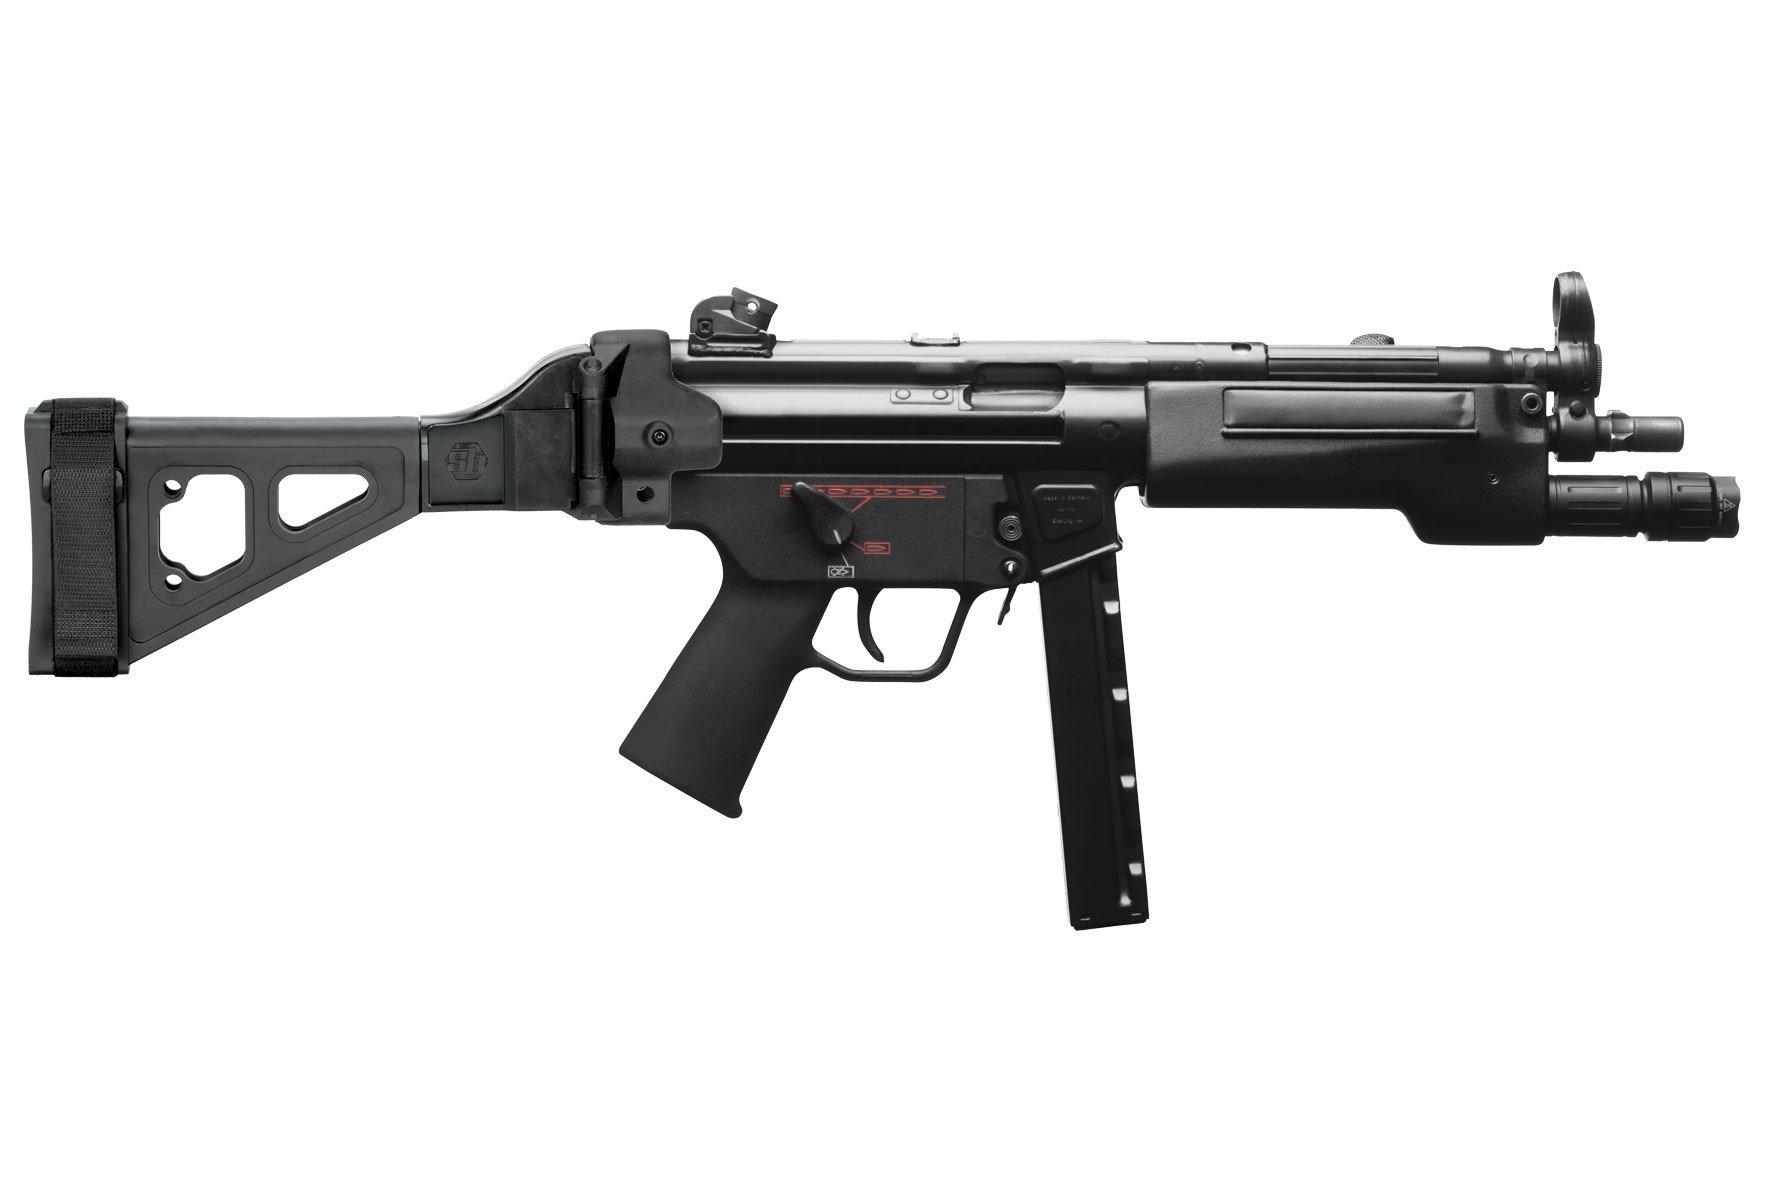 SB Tactical SBT5 Pistol Stabilizing Brace